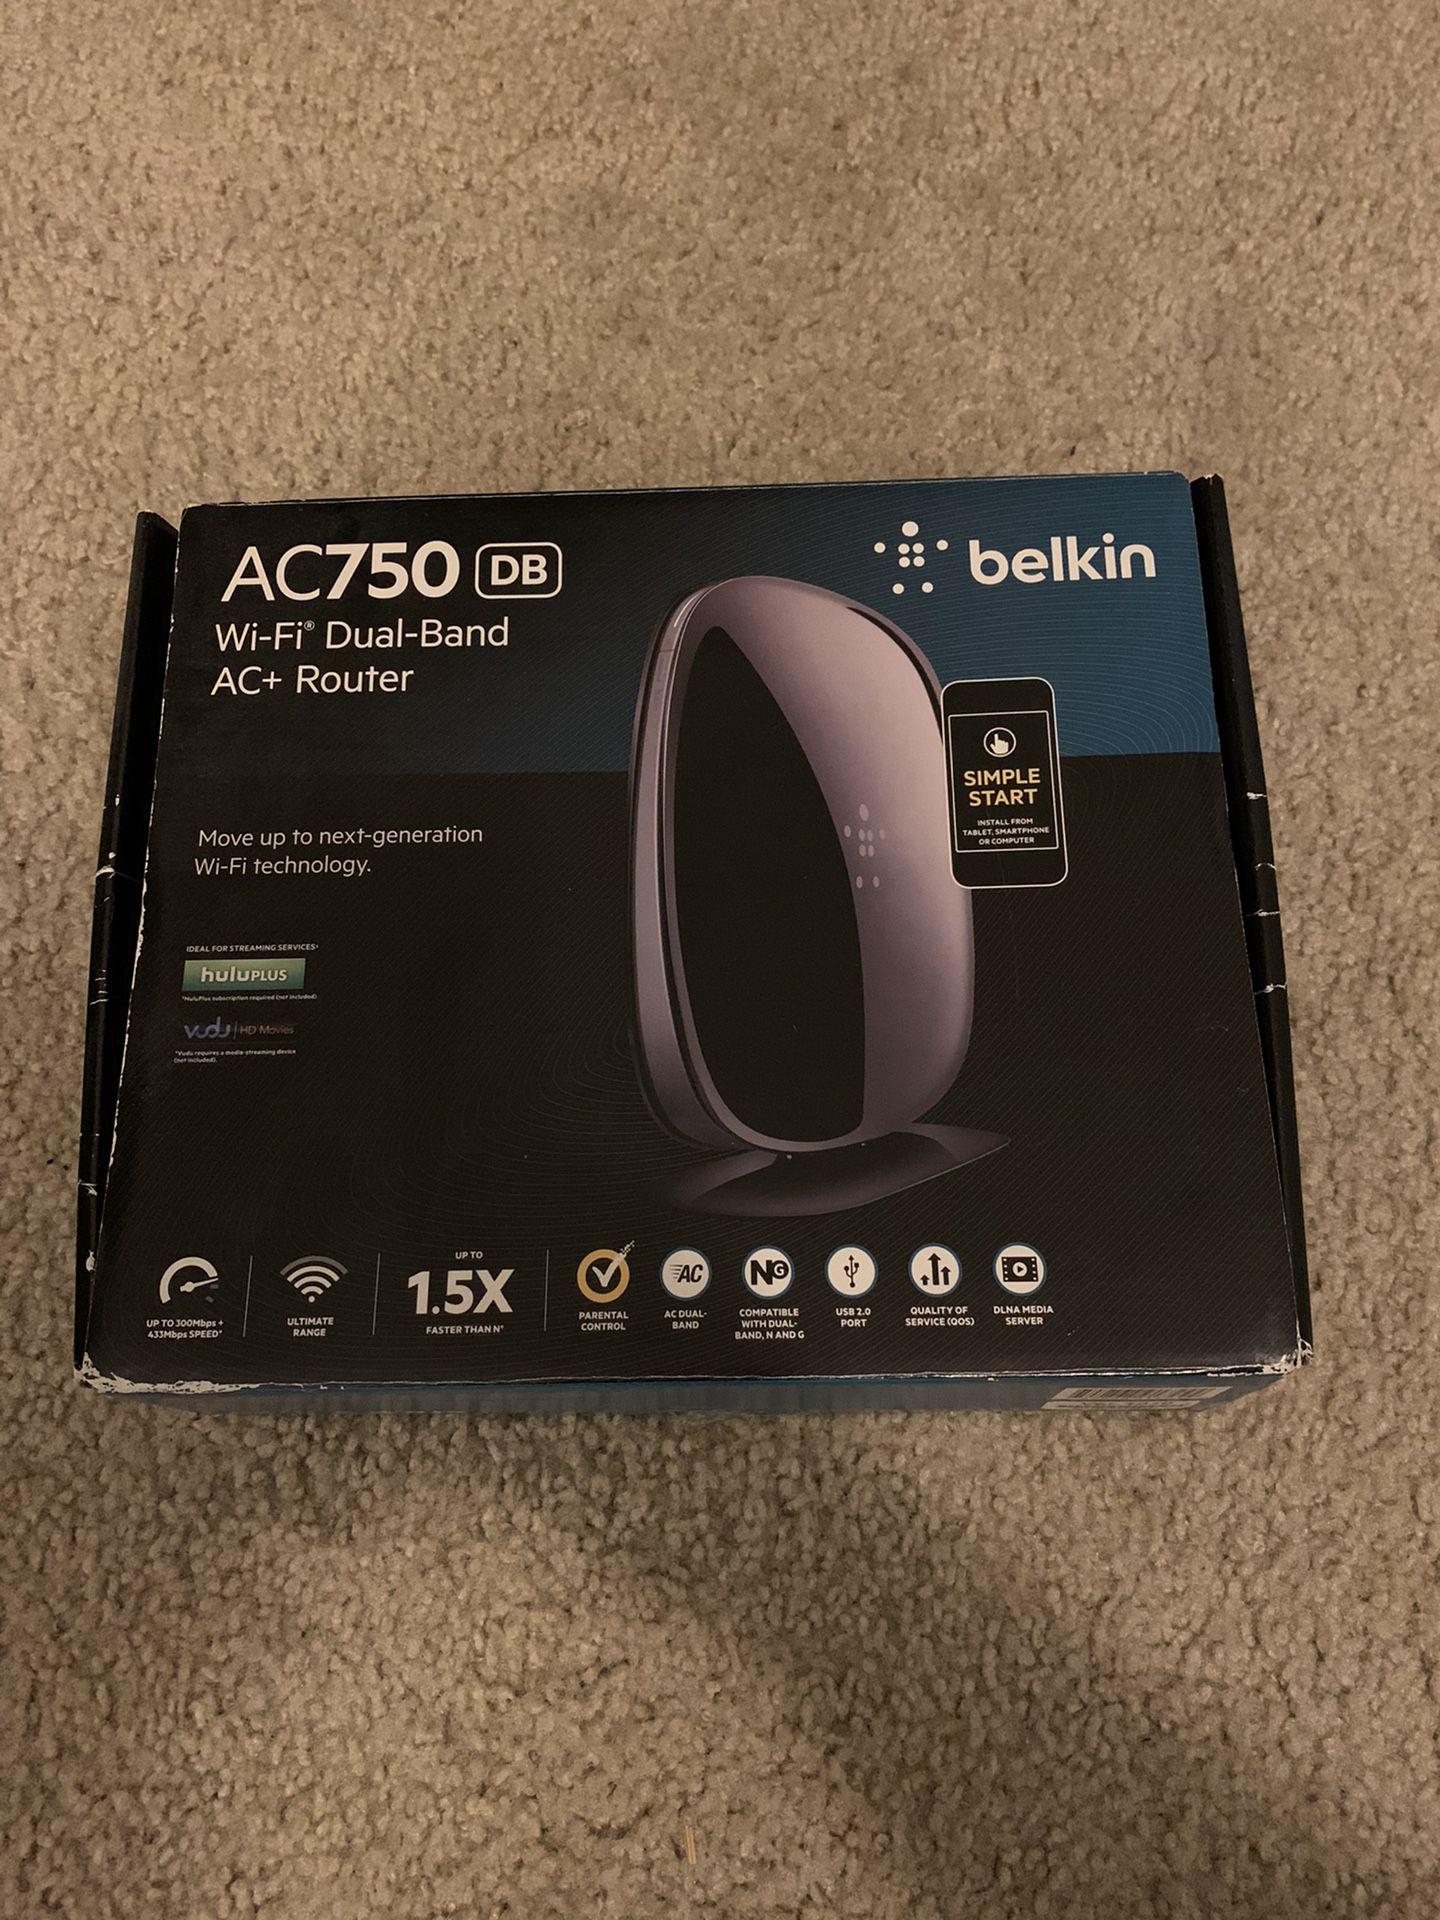 Belkin AC750 Wi-Fi Dual-Band AC+ Router